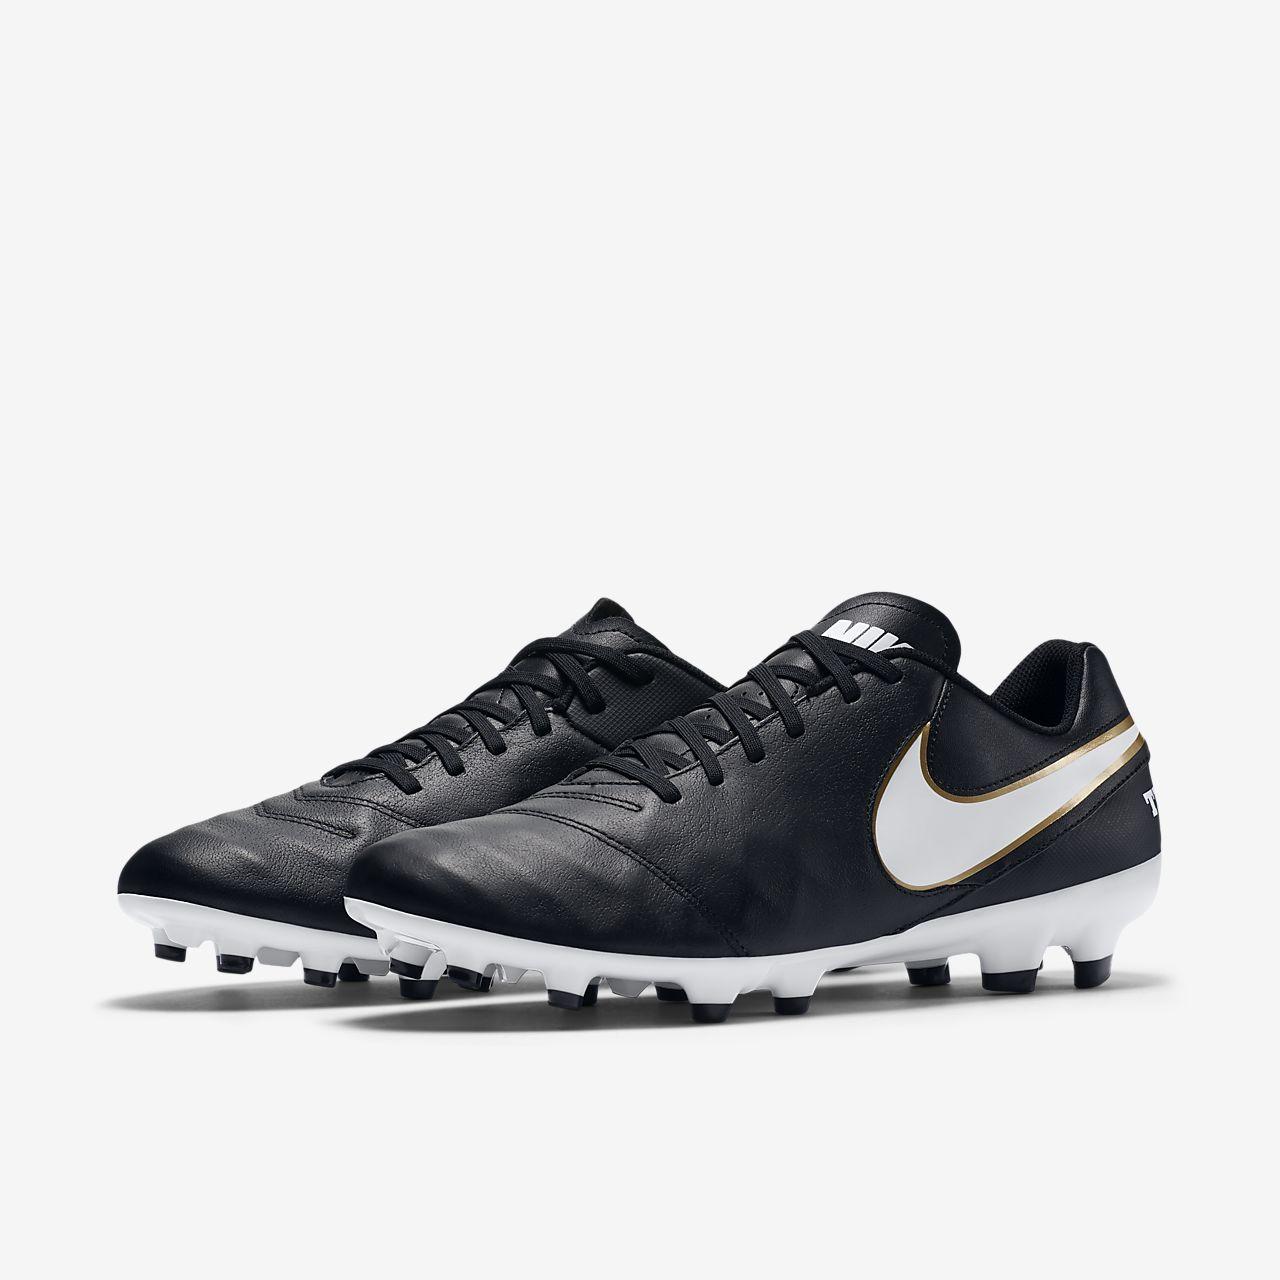 Chaussure de football à crampons pour terrain sec Nike Tiempo Genio II  Leather